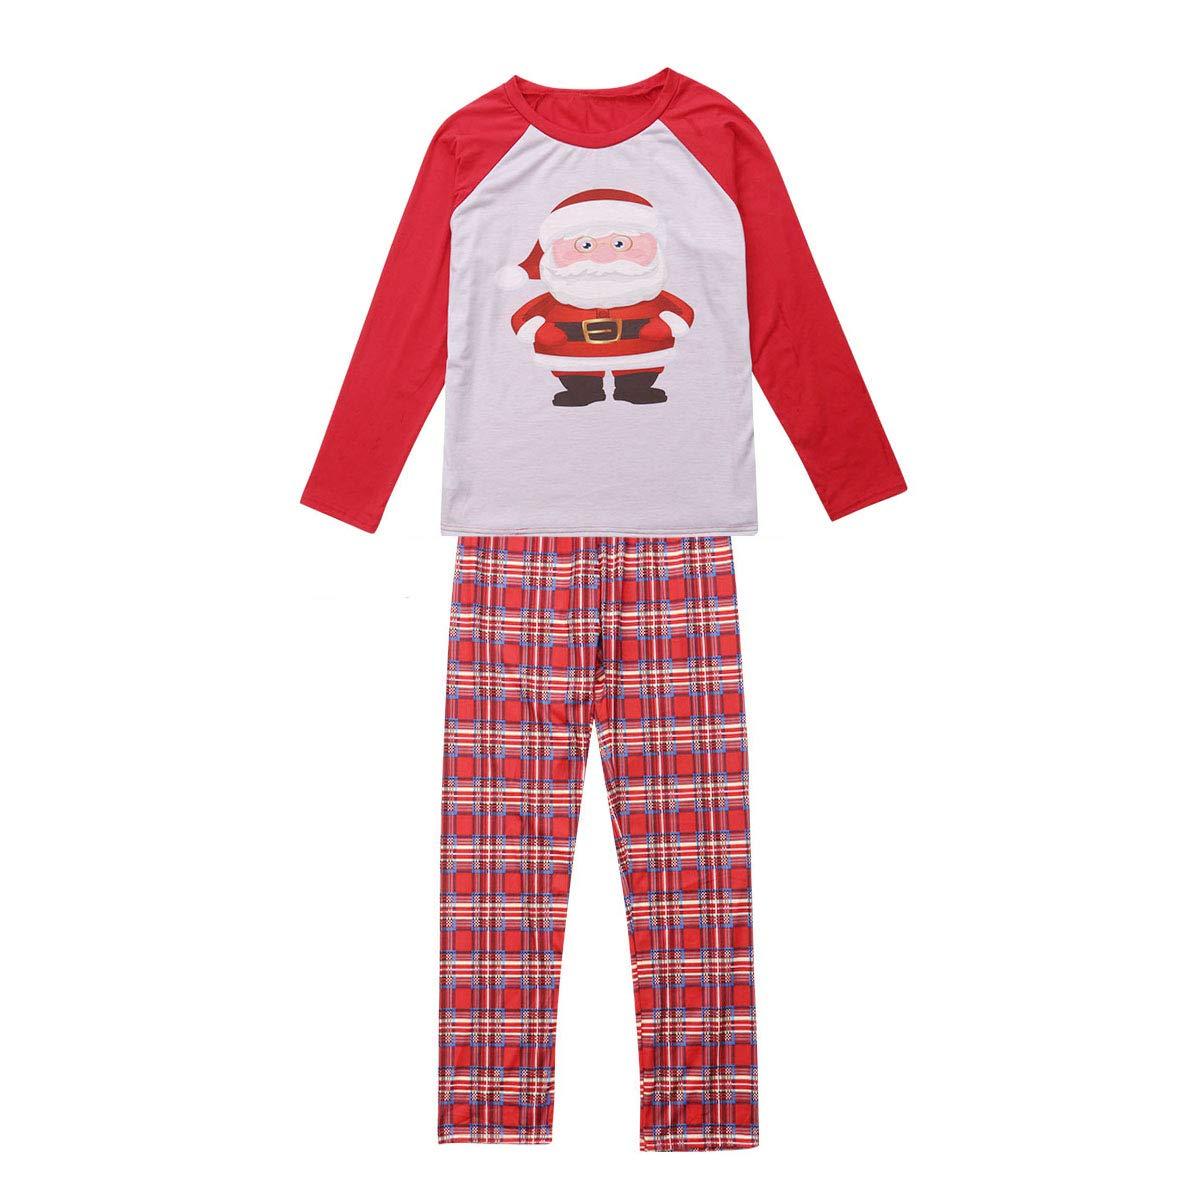 Christmas Matching Family Pajamas Set Xmas Sleepwear Parent-Child Nightwear Santa  Claus Print Tops + Plaids Pants 1779f7d4f